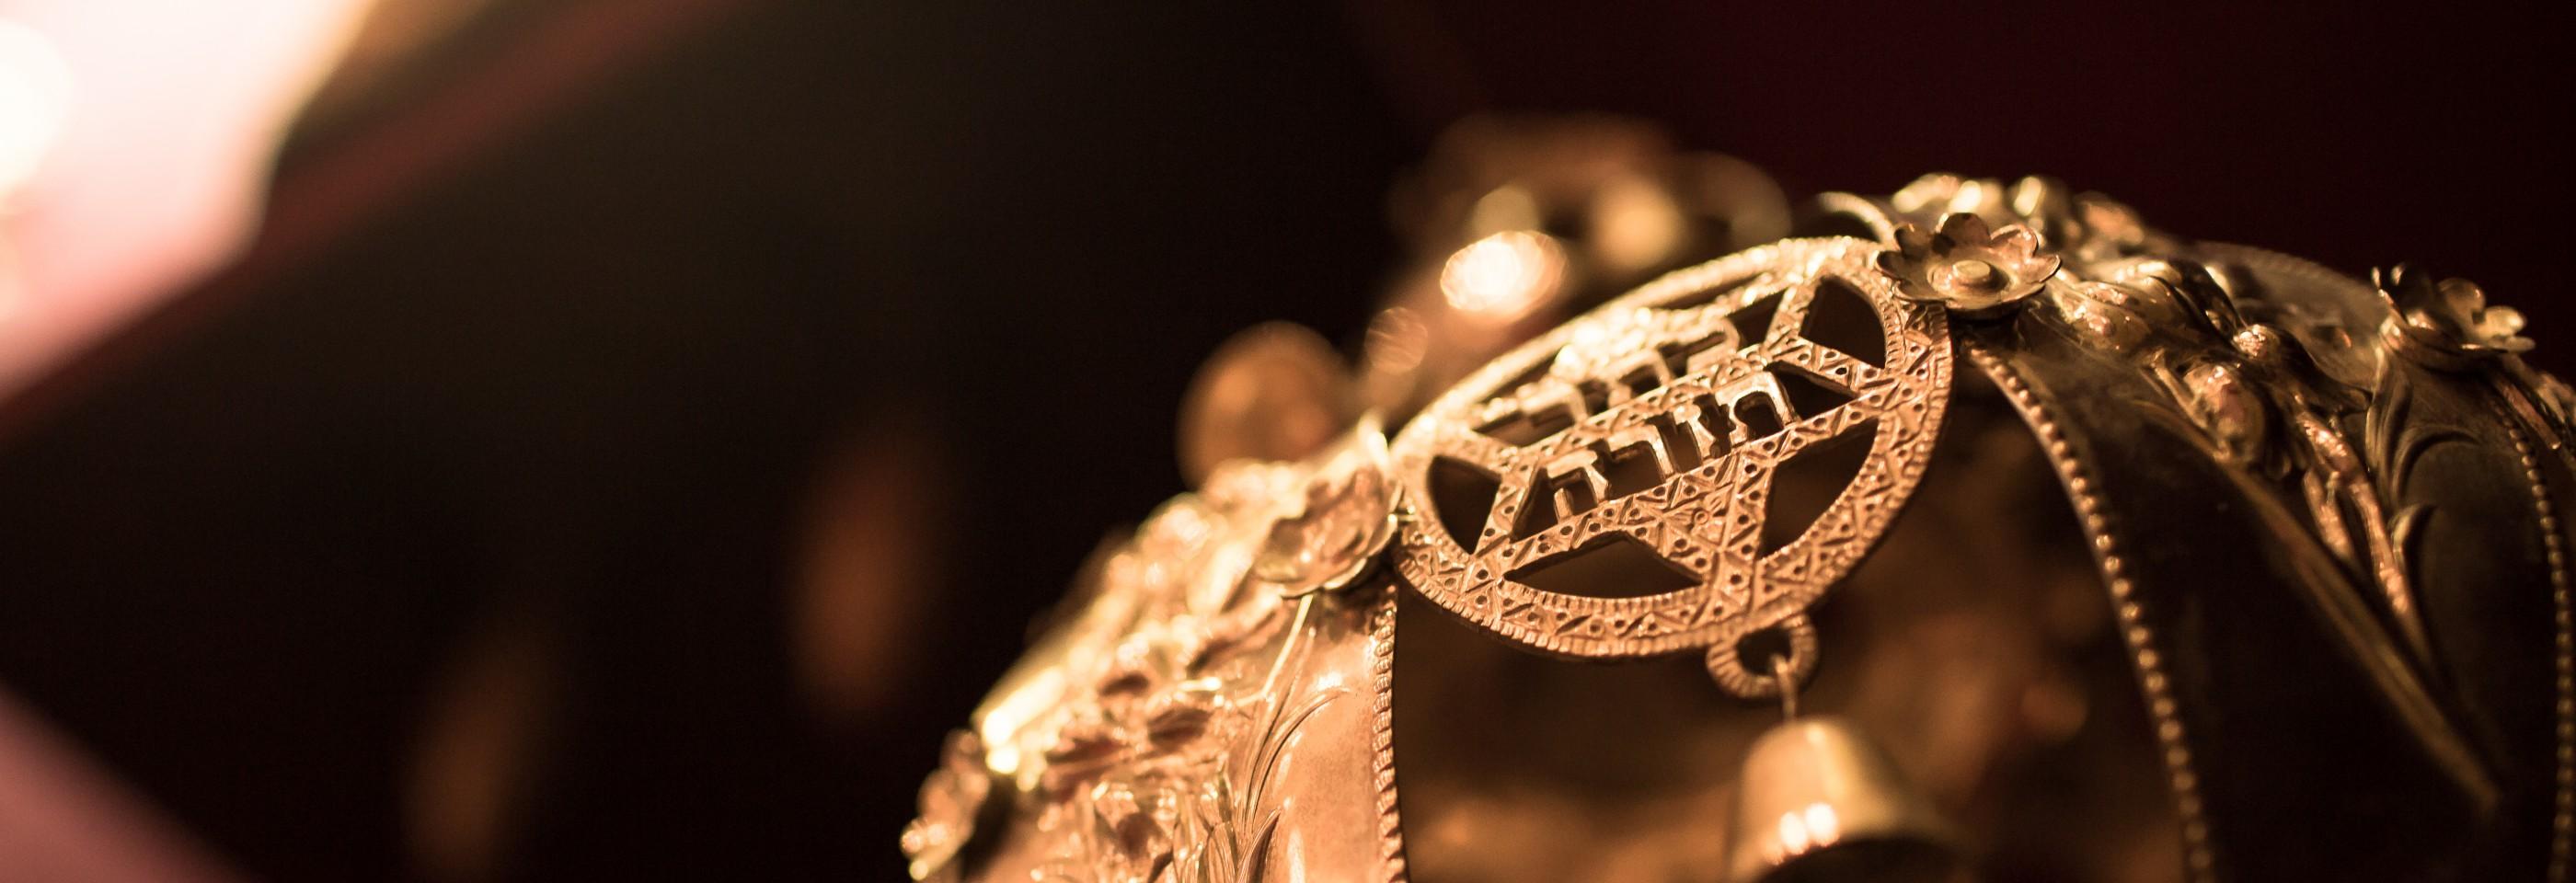 Crown of torah, picture of a keter torah